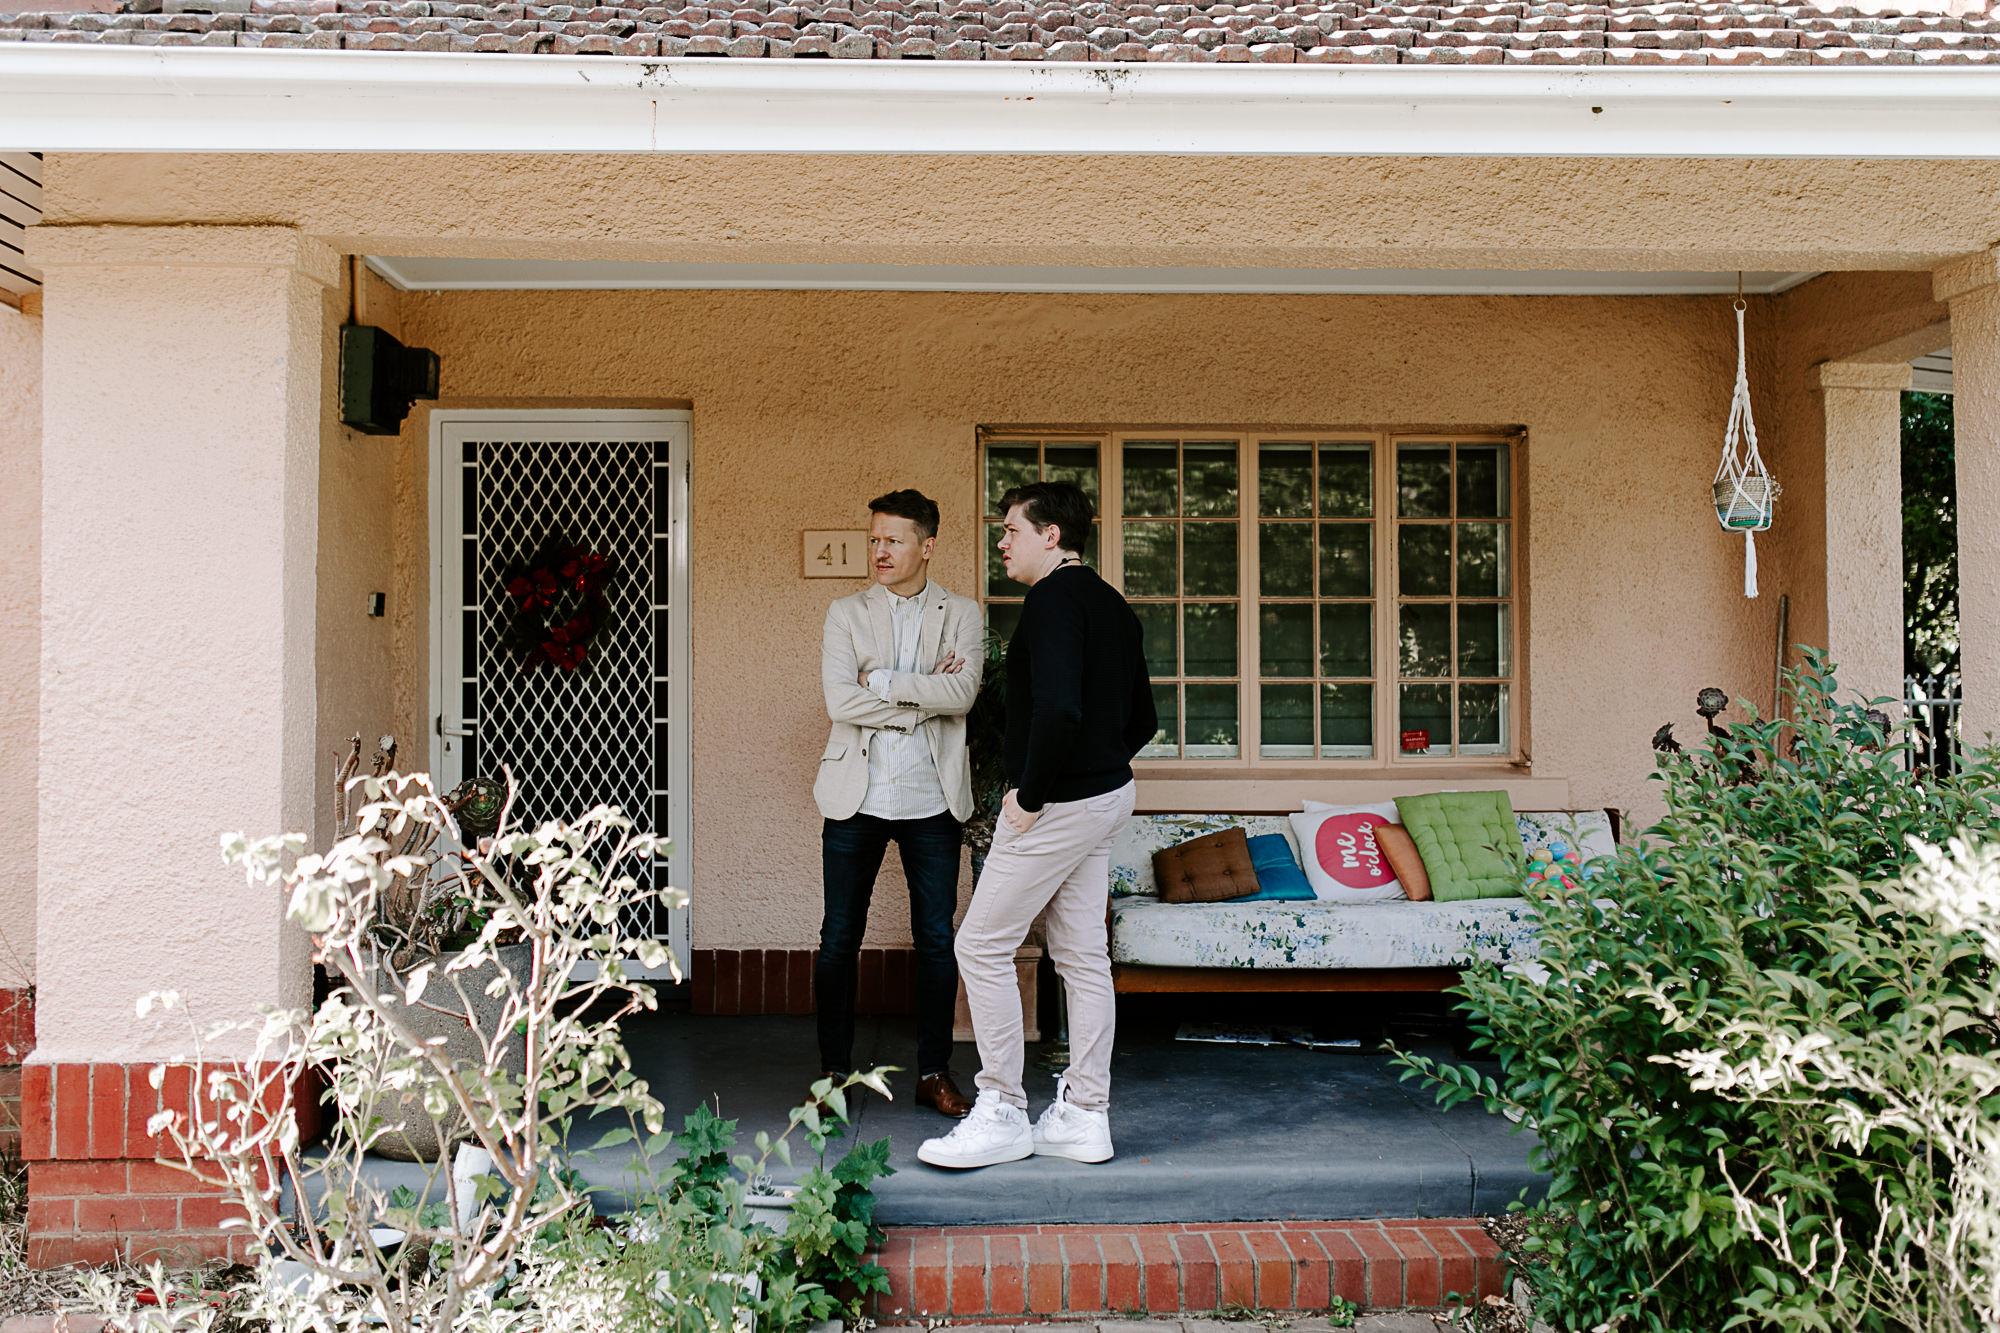 Home Stories: Pat Rose